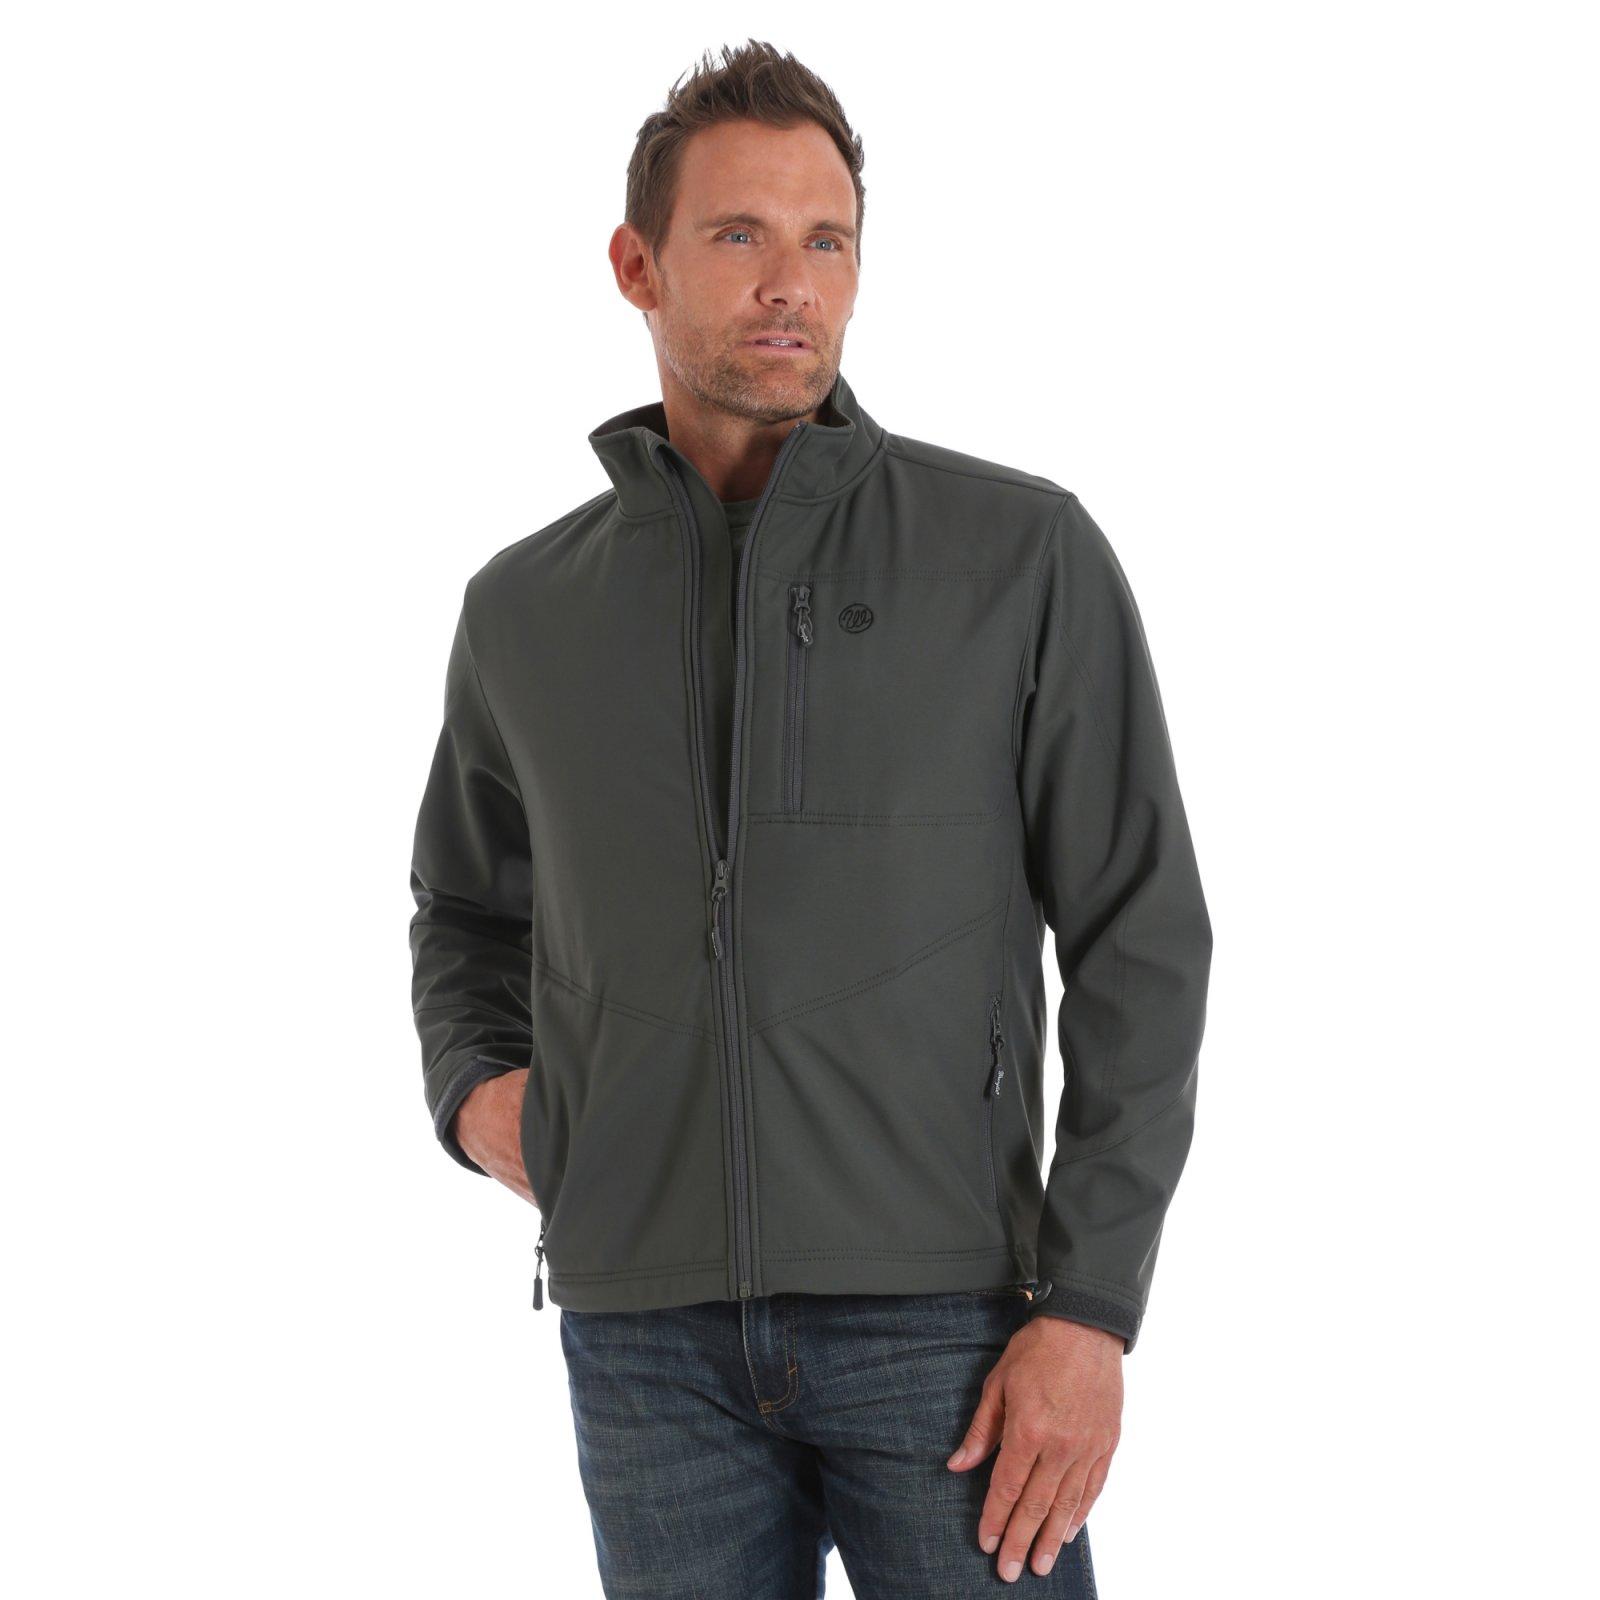 Trail Jacket from Wrangler